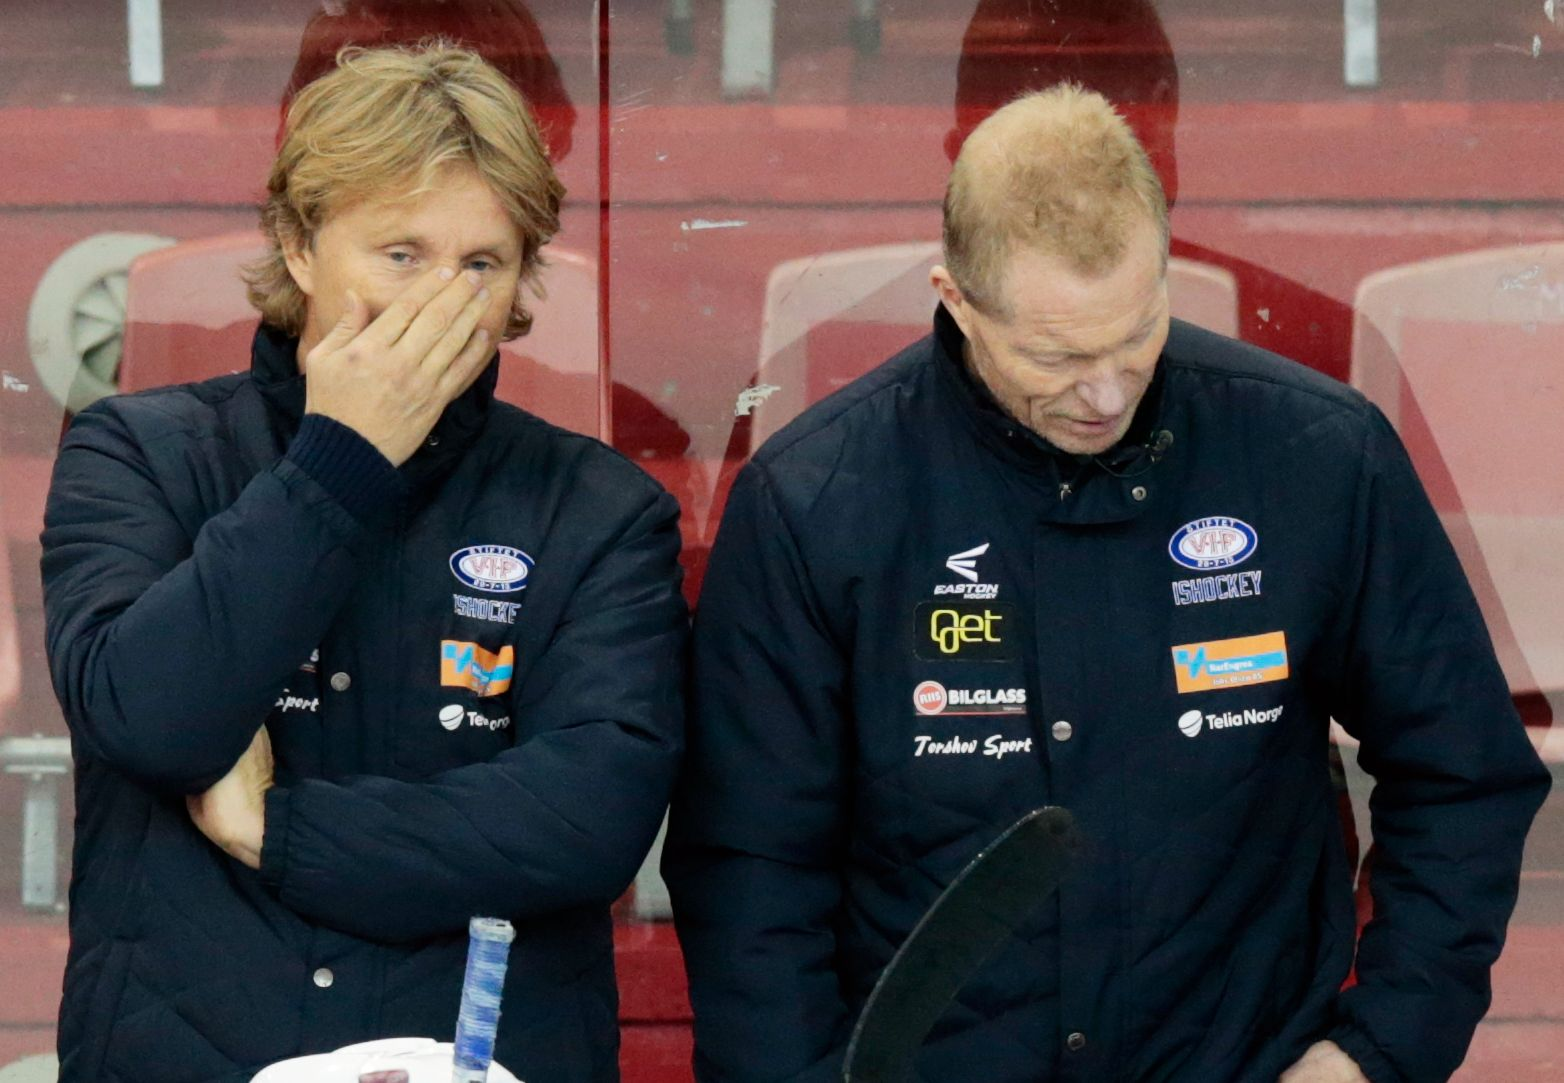 FLYTTESJAU PÅ GANG: Trenerne Espen Knutsen og Roy Johansen i Vålerengas spillerboks, der de skal stå tre kamper til før flyttingen til Manglerudhallen.